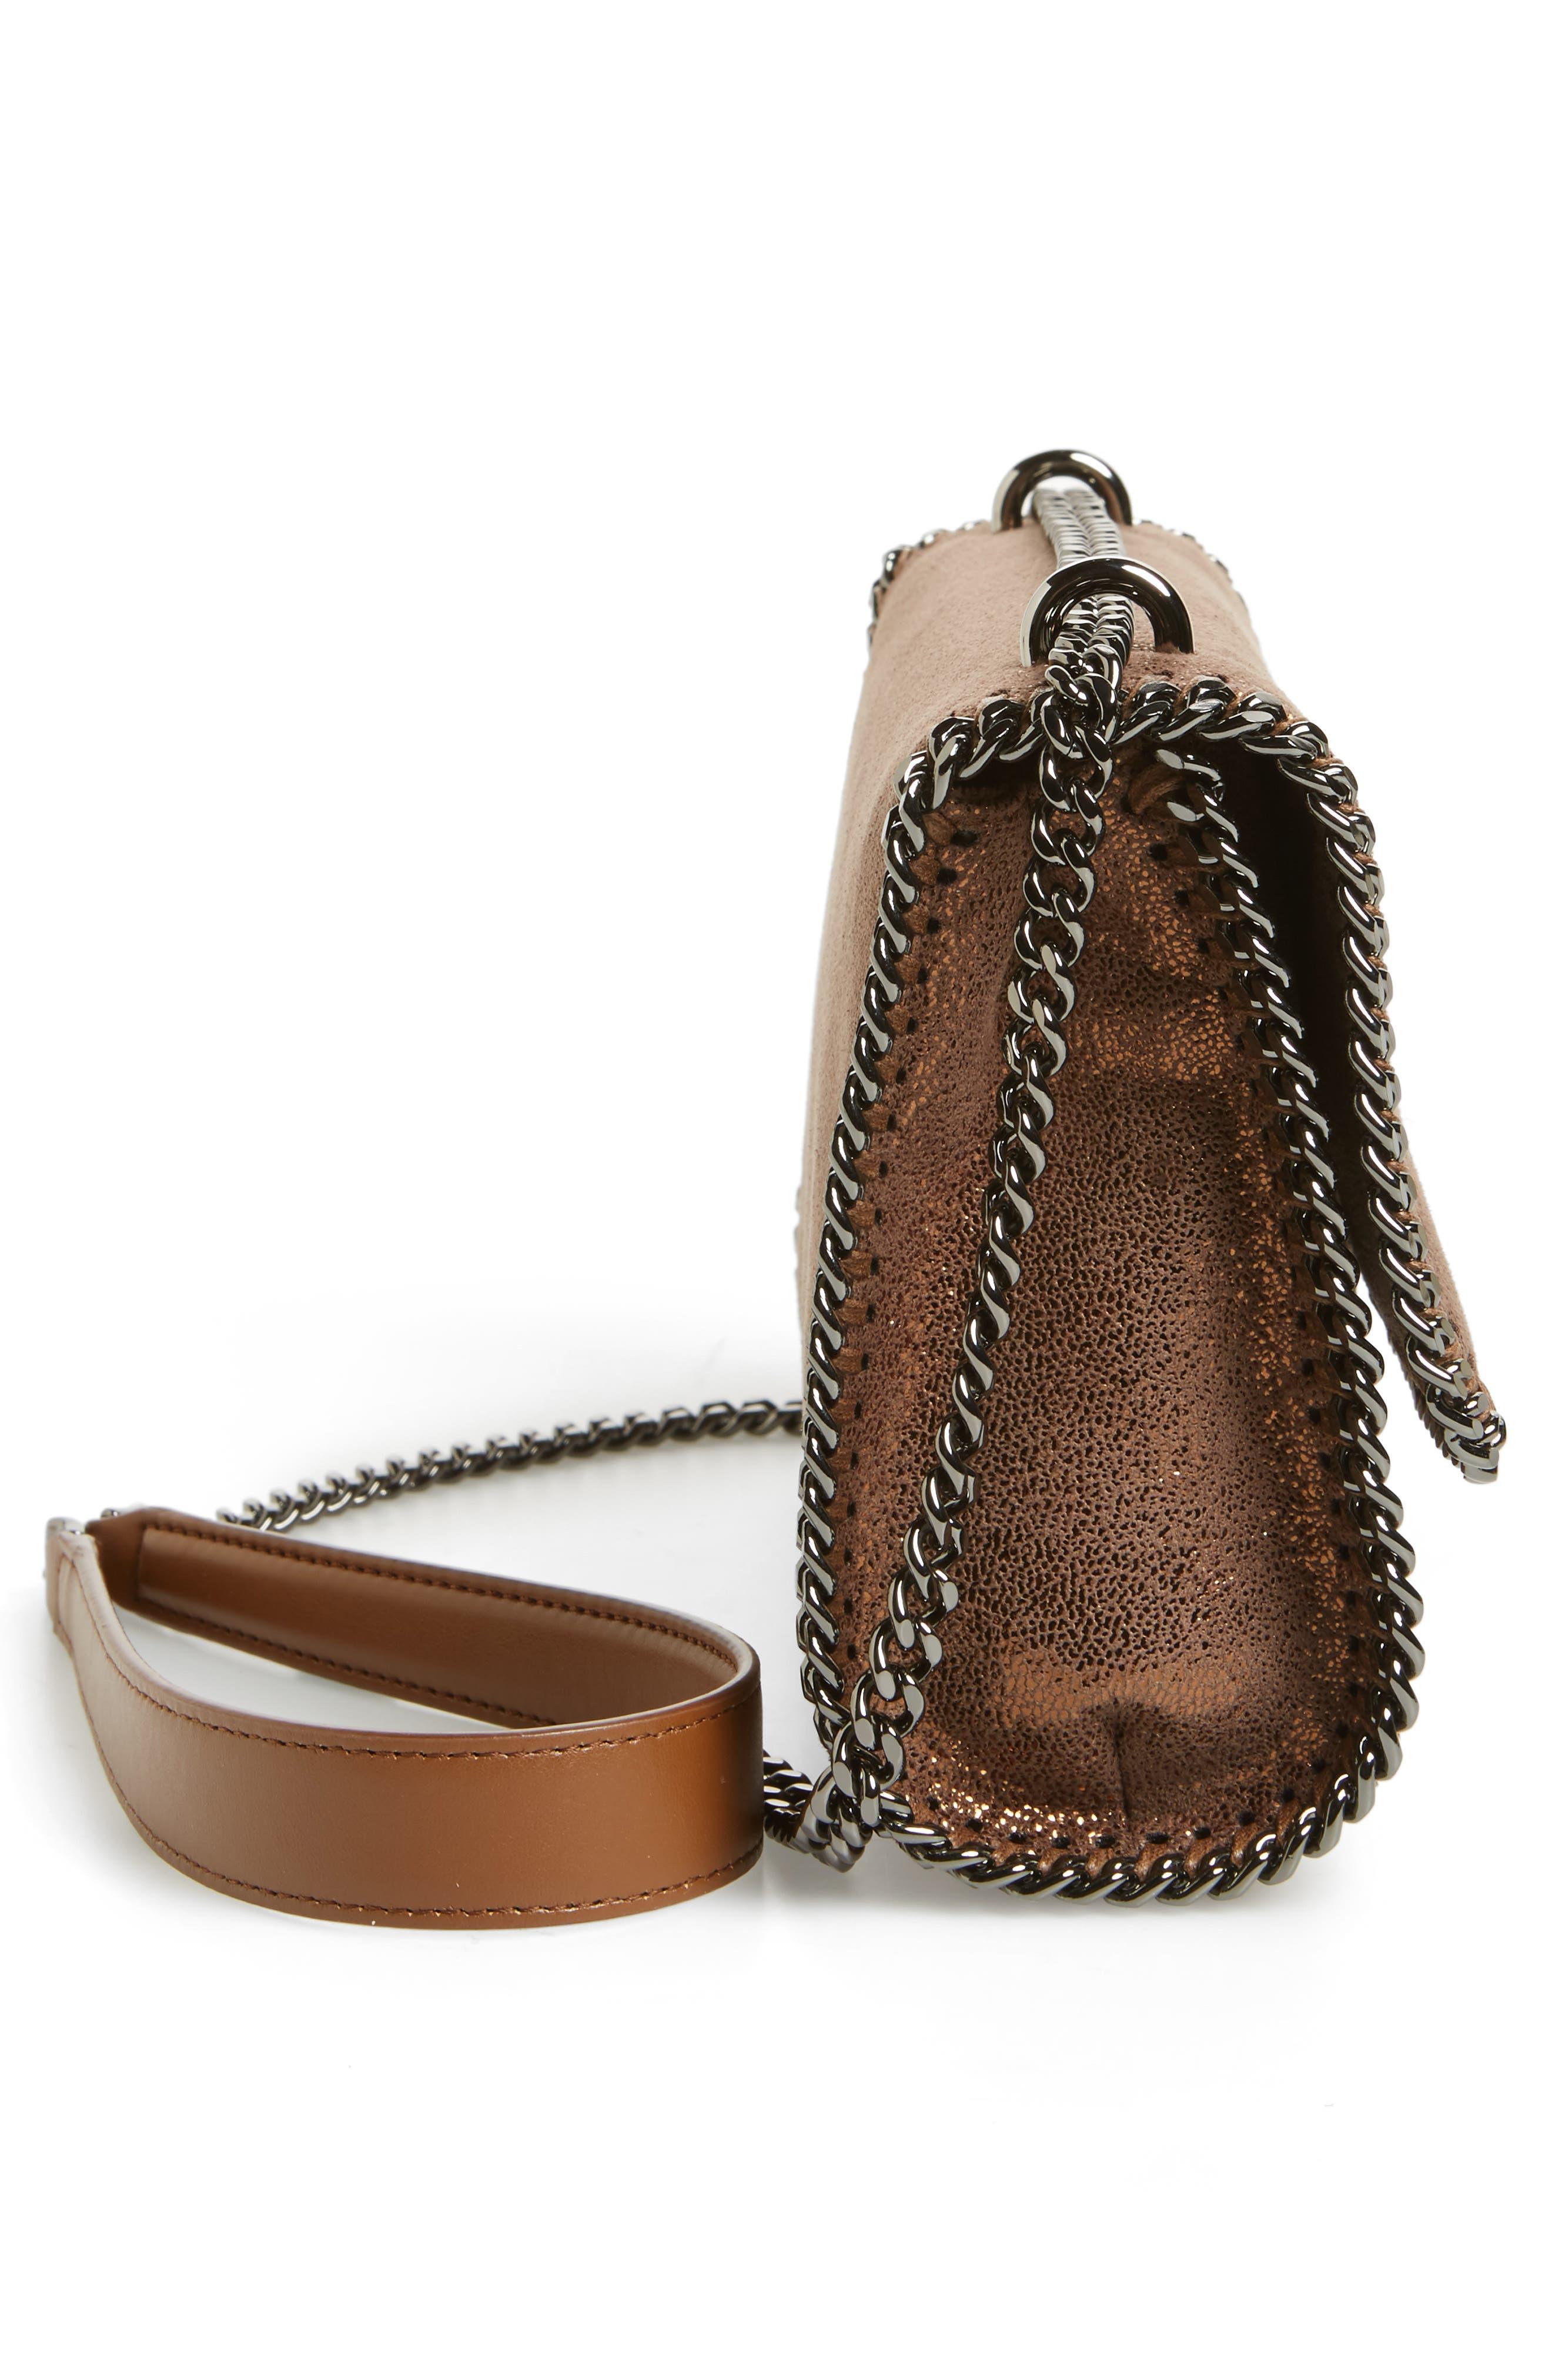 Falabella Metallic Faux Leather Convertible Shoulder Bag,                             Alternate thumbnail 5, color,                             200